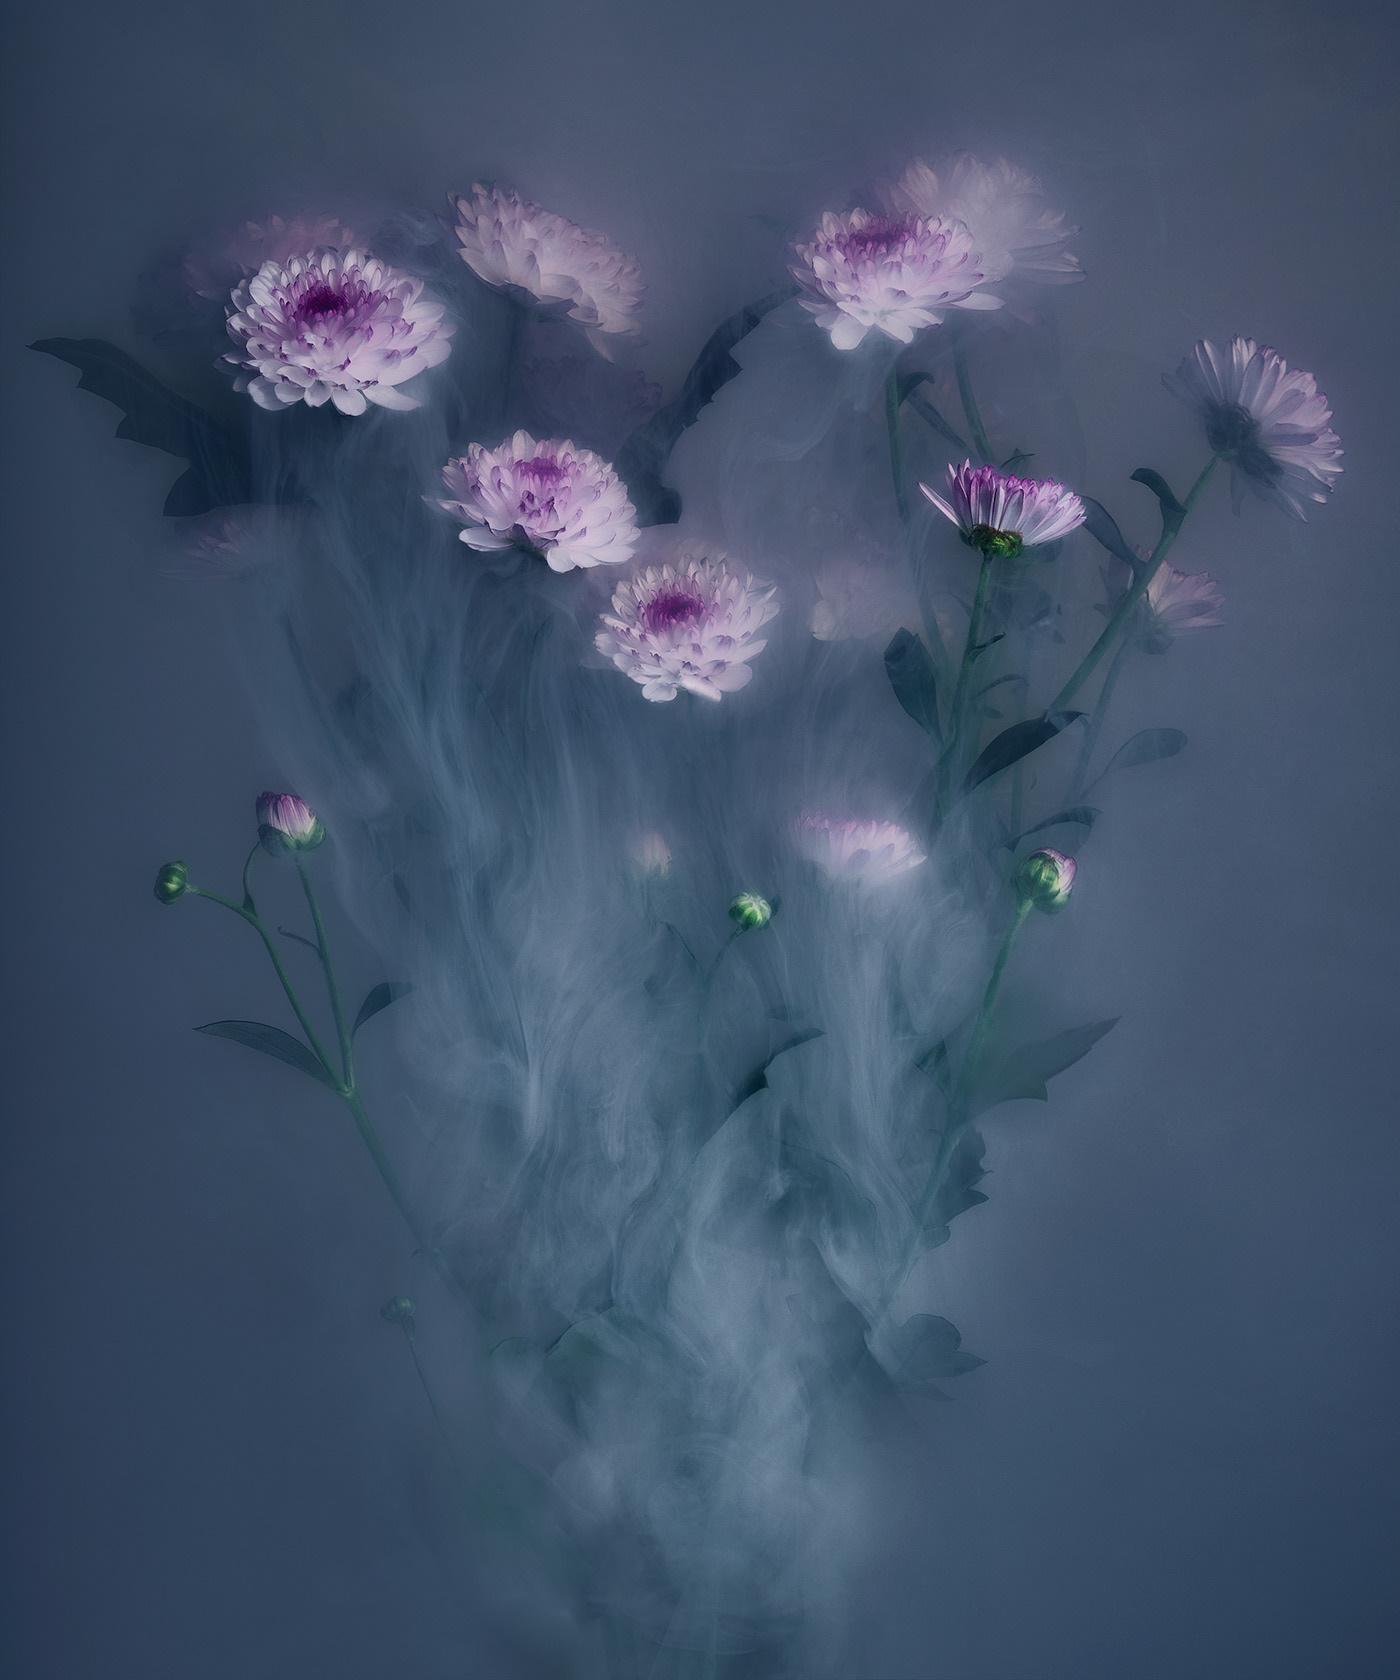 FlowerPower / фотограф Robert Peek